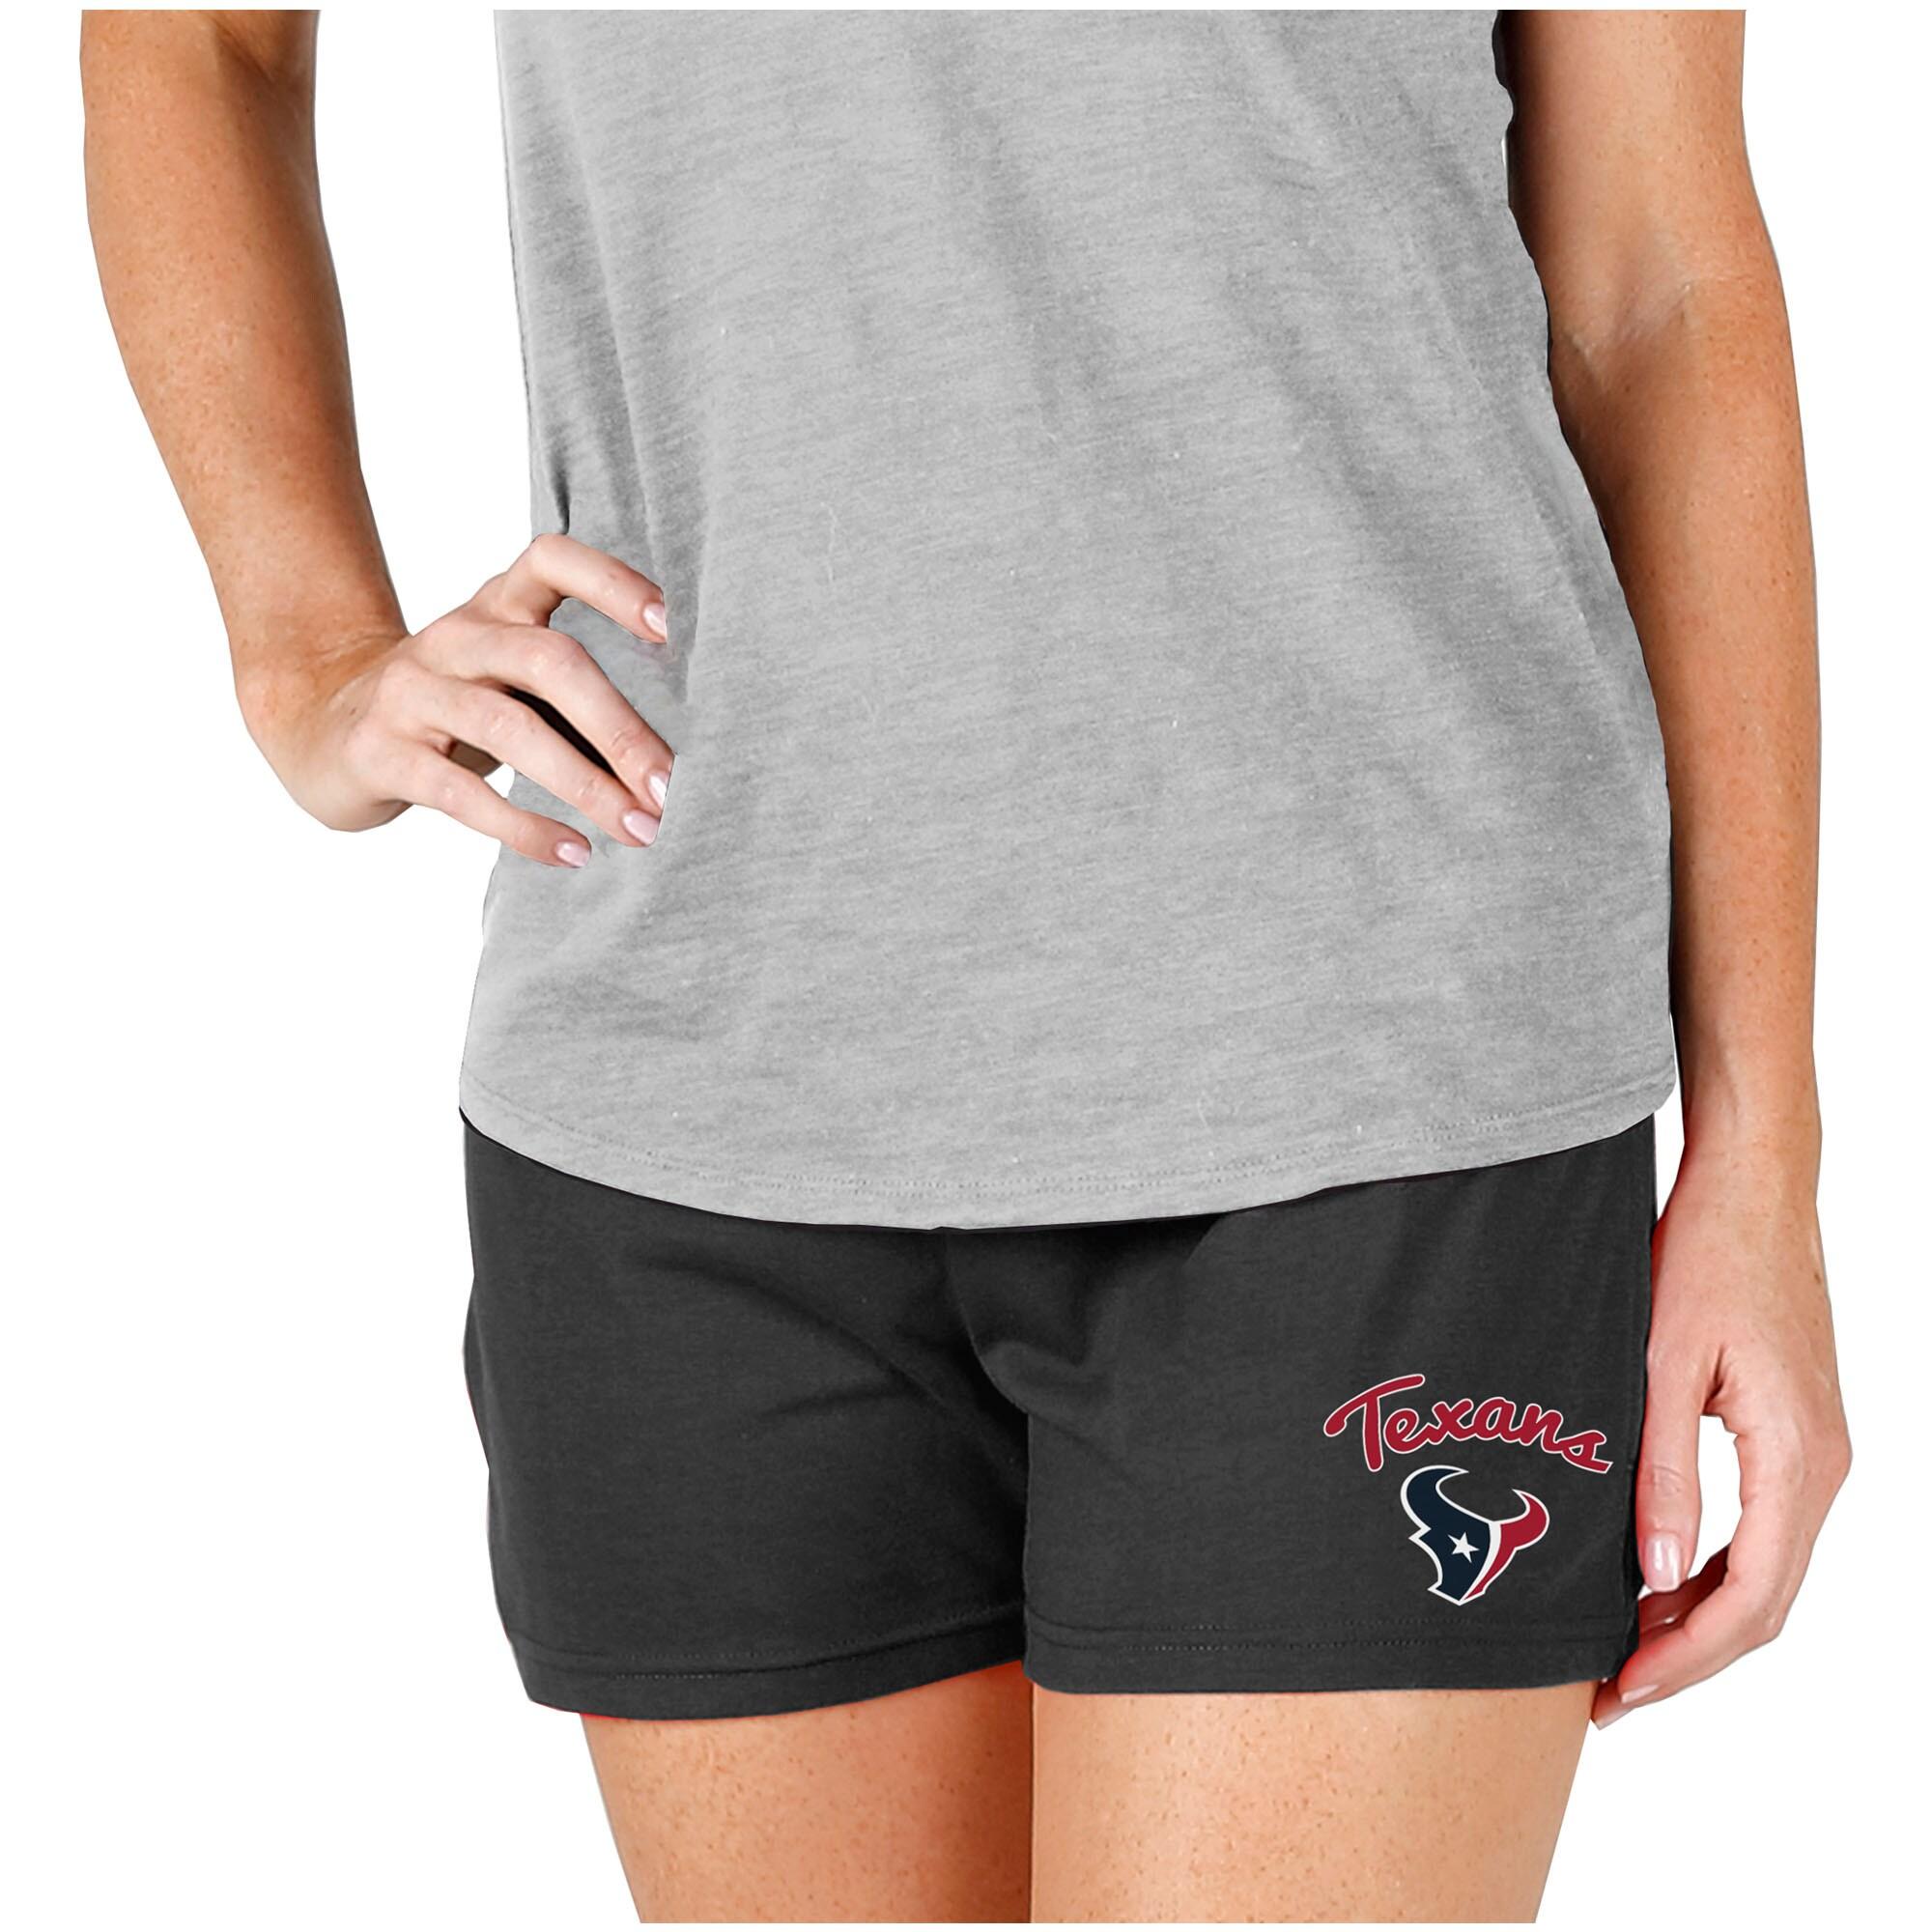 Houston Texans Concepts Sport Women's Knit Shorts - Charcoal